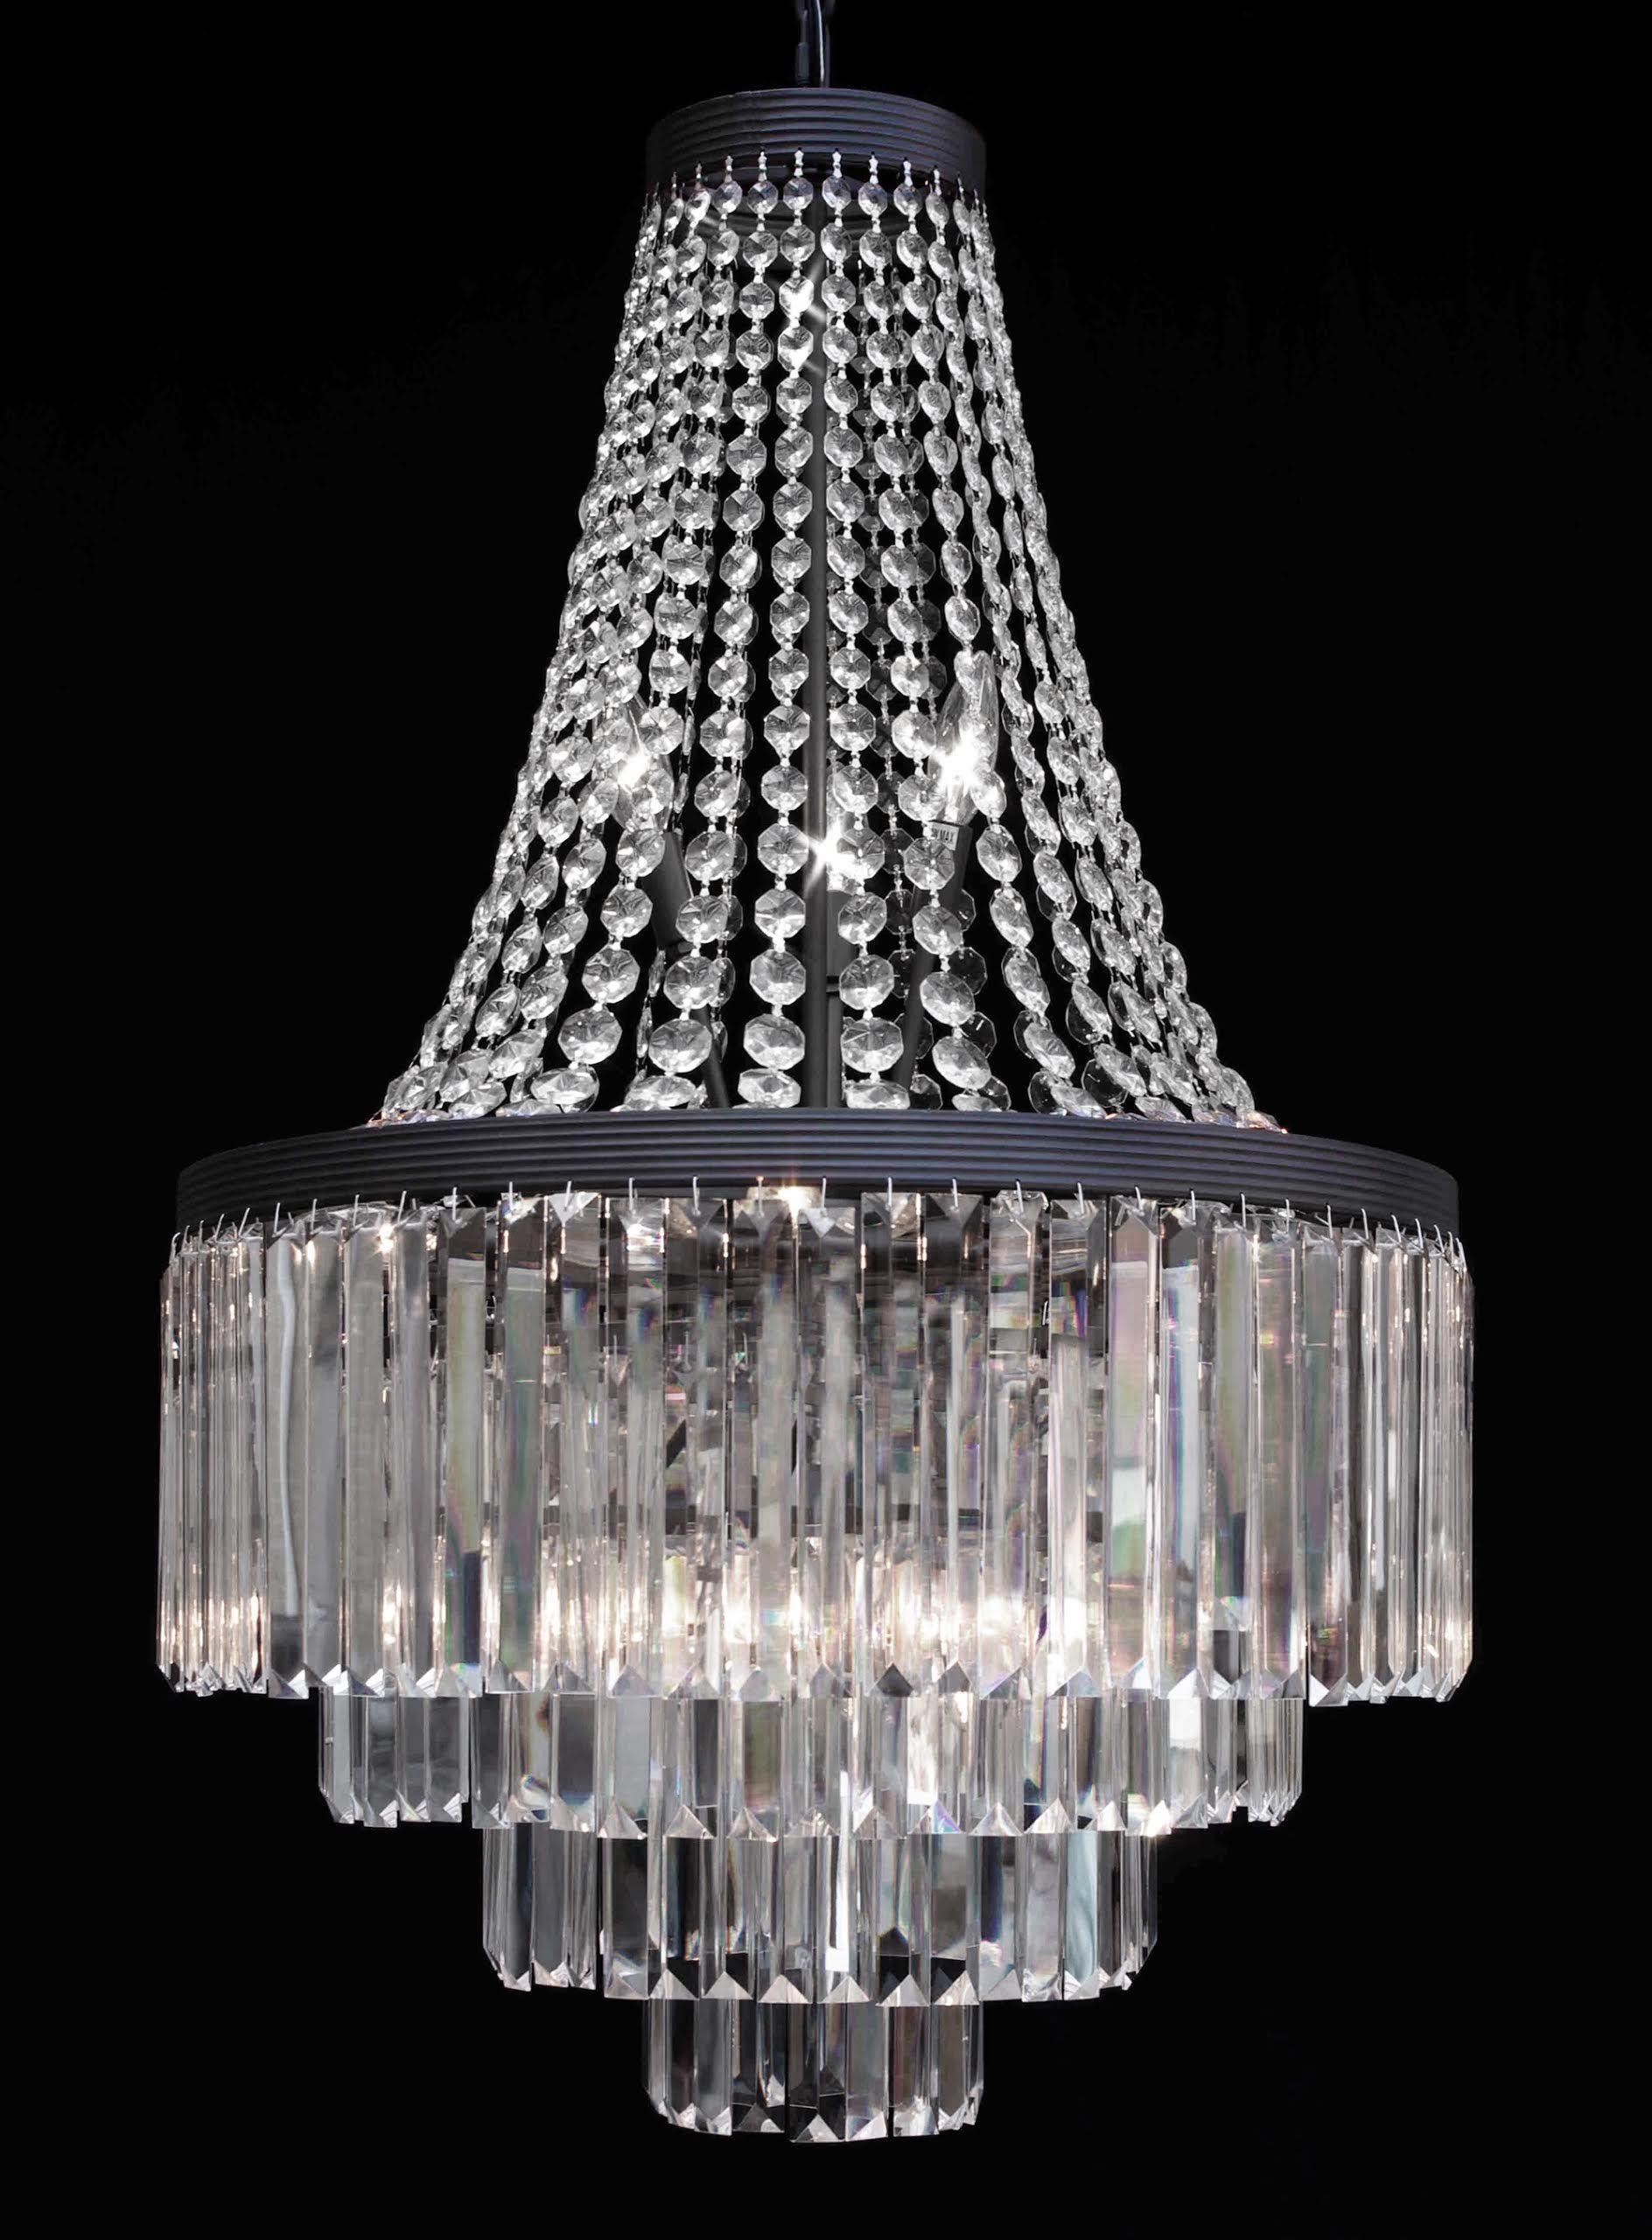 G7 218311 gallery chandeliers retro odeon crystal glass fringe 3 g7 218311 gallery chandeliers retro odeon crystal glass fringe 3 tier chandelier rectangular arubaitofo Gallery